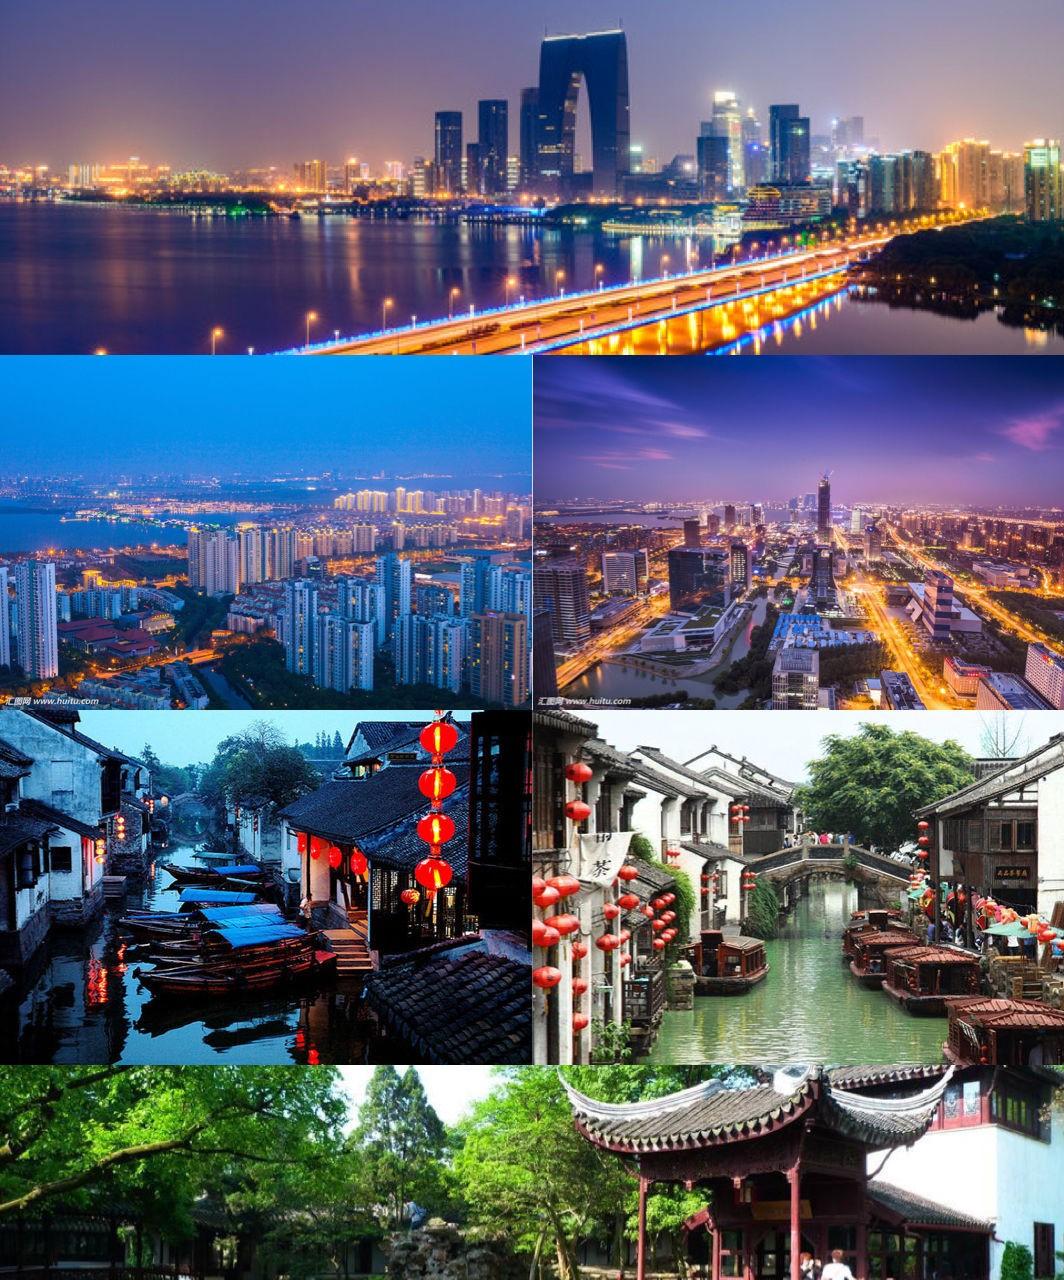 728da9773912b31b0fa9c69c8a18367adbb4e1ba-Dulwich_International_High_School_Suzhou